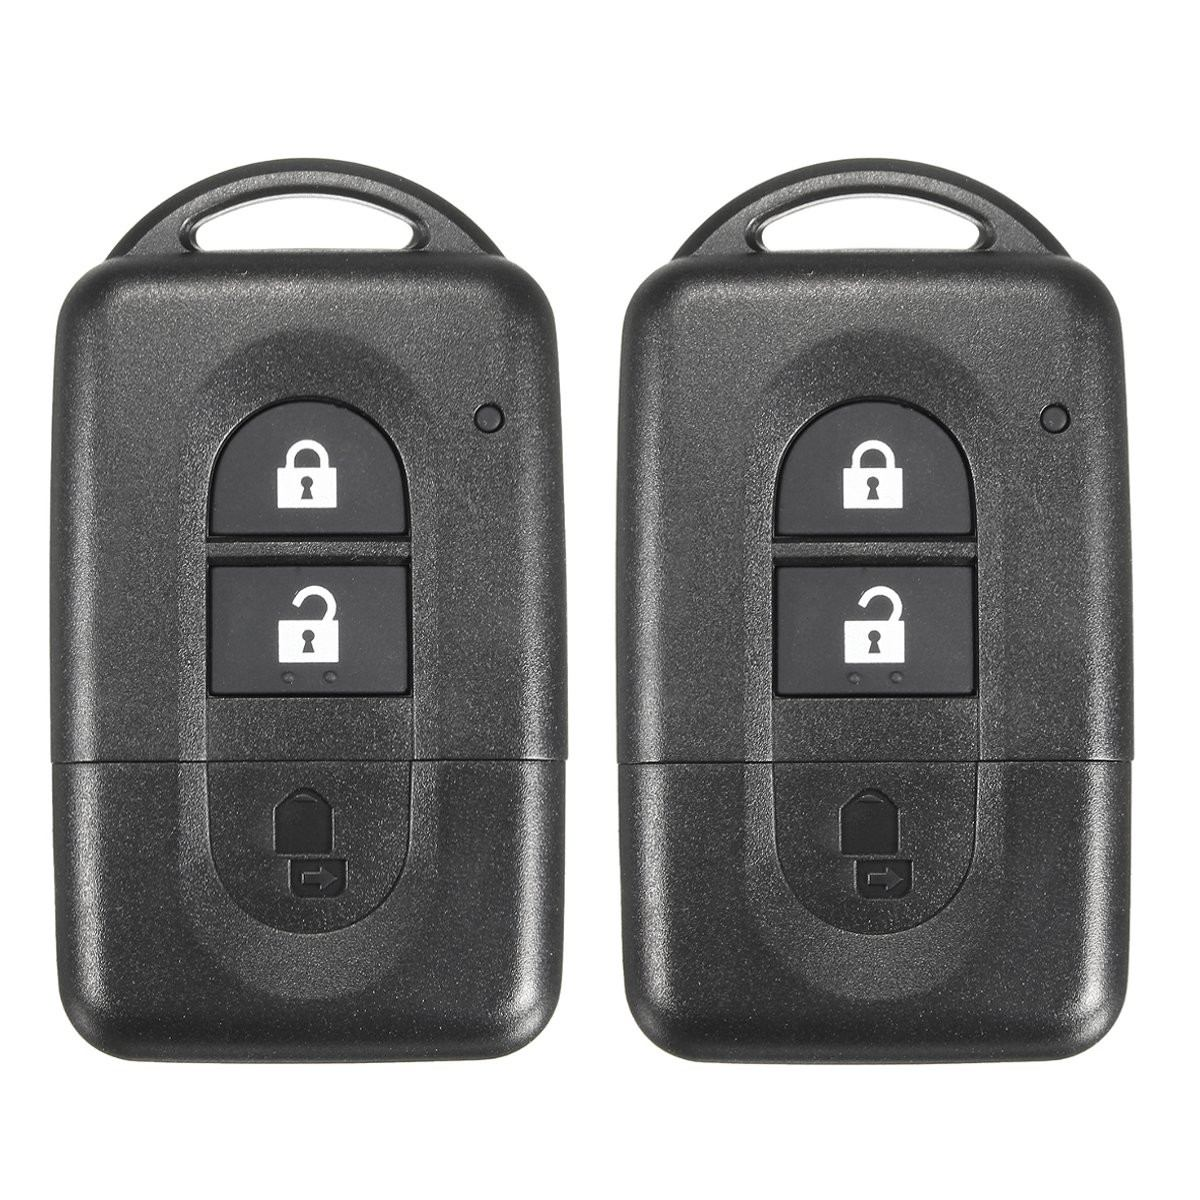 For NISSAN MICRA X-TRAIL QASHQAI JUKE DUKE NAVARA Pair 2 Button Car Remote Smart Key FOB Case Shell